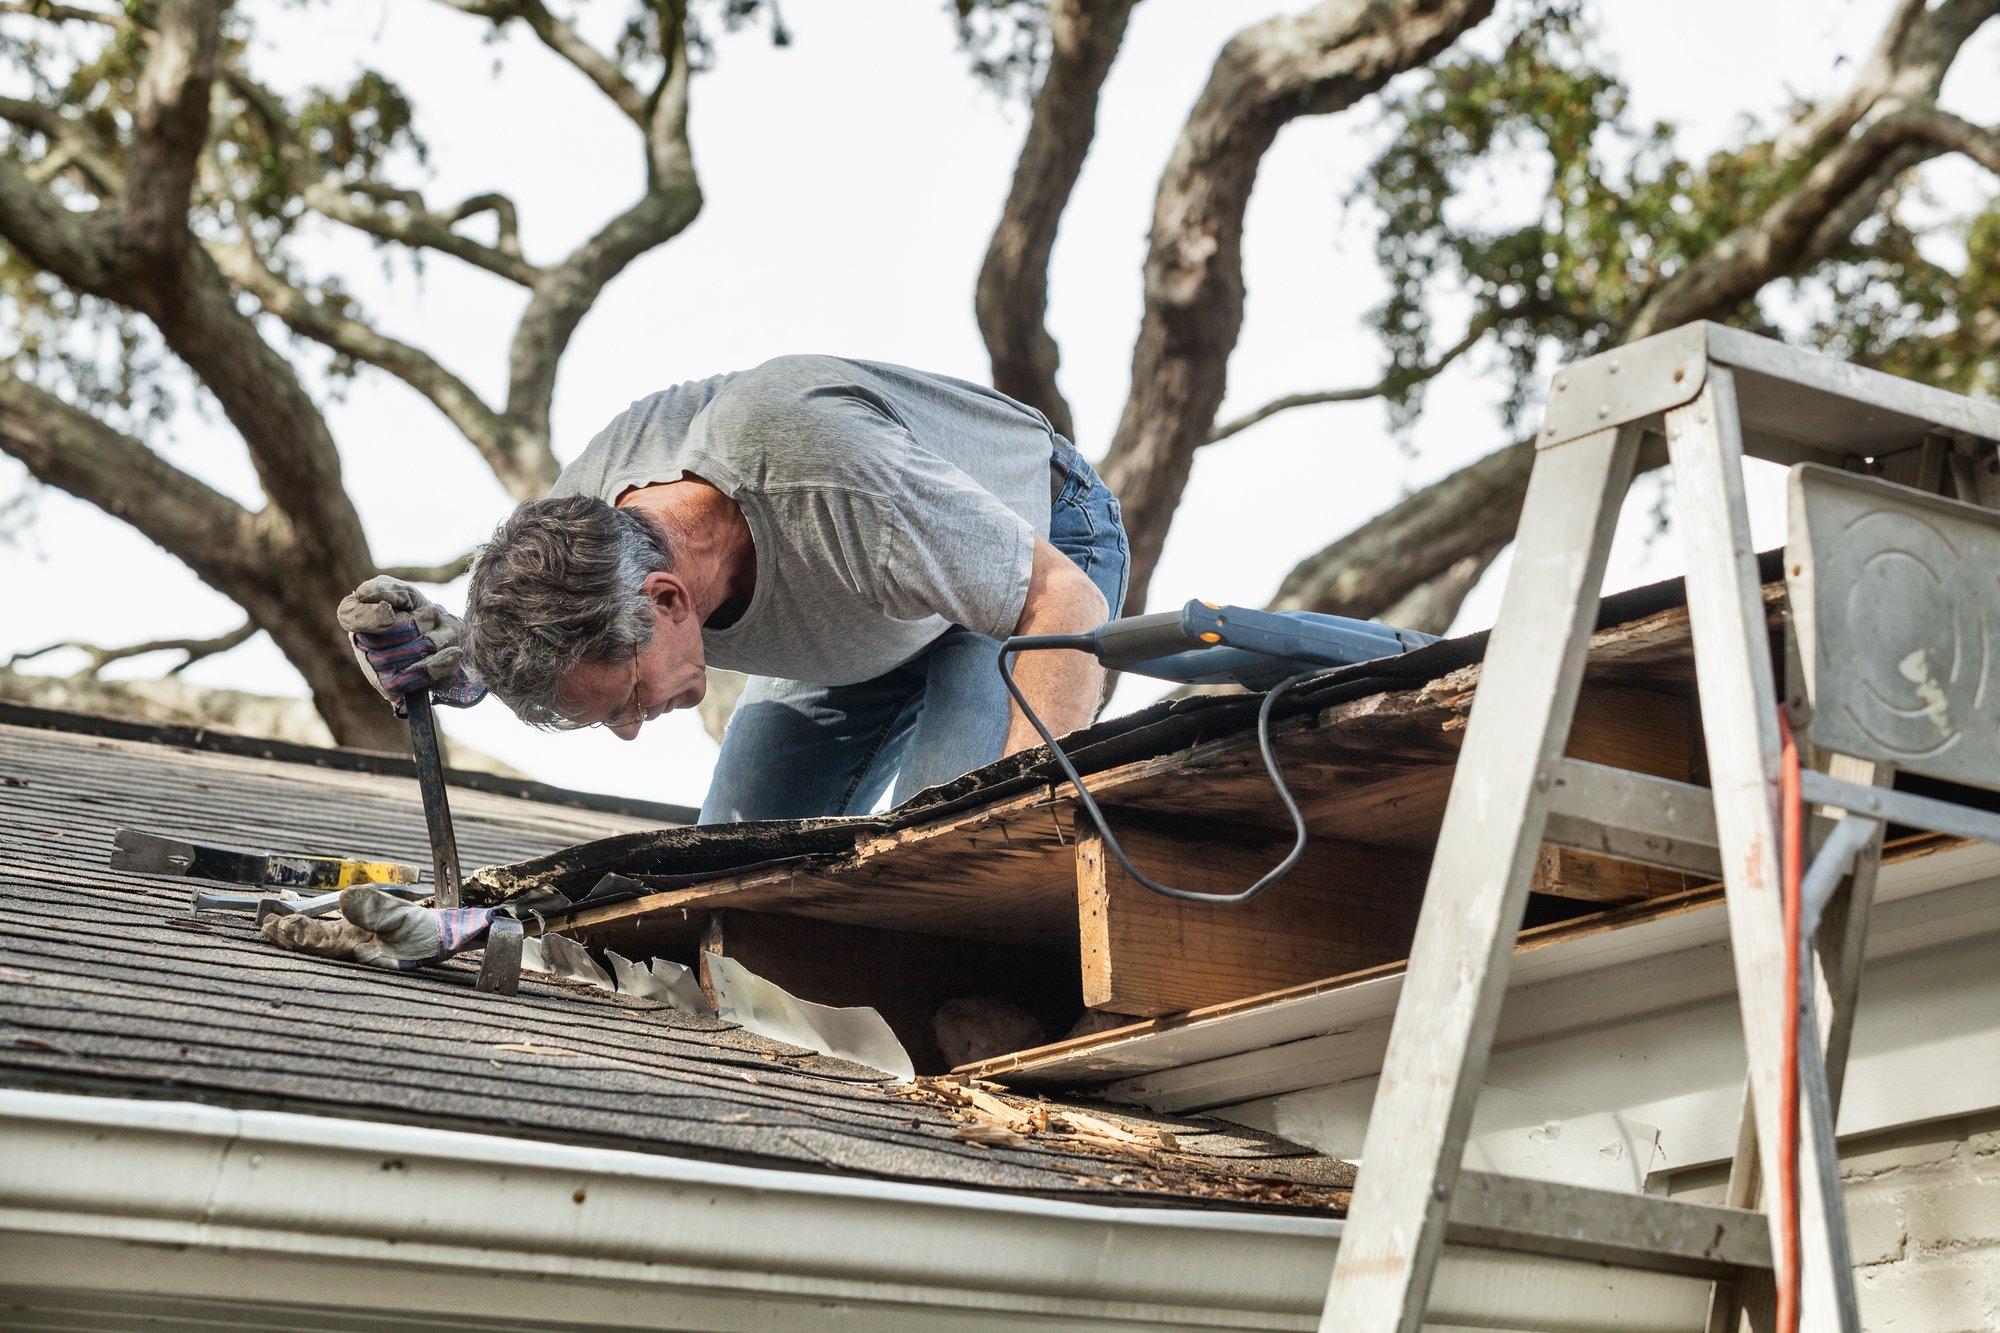 Man Examining and Repairing Leaking House Roof